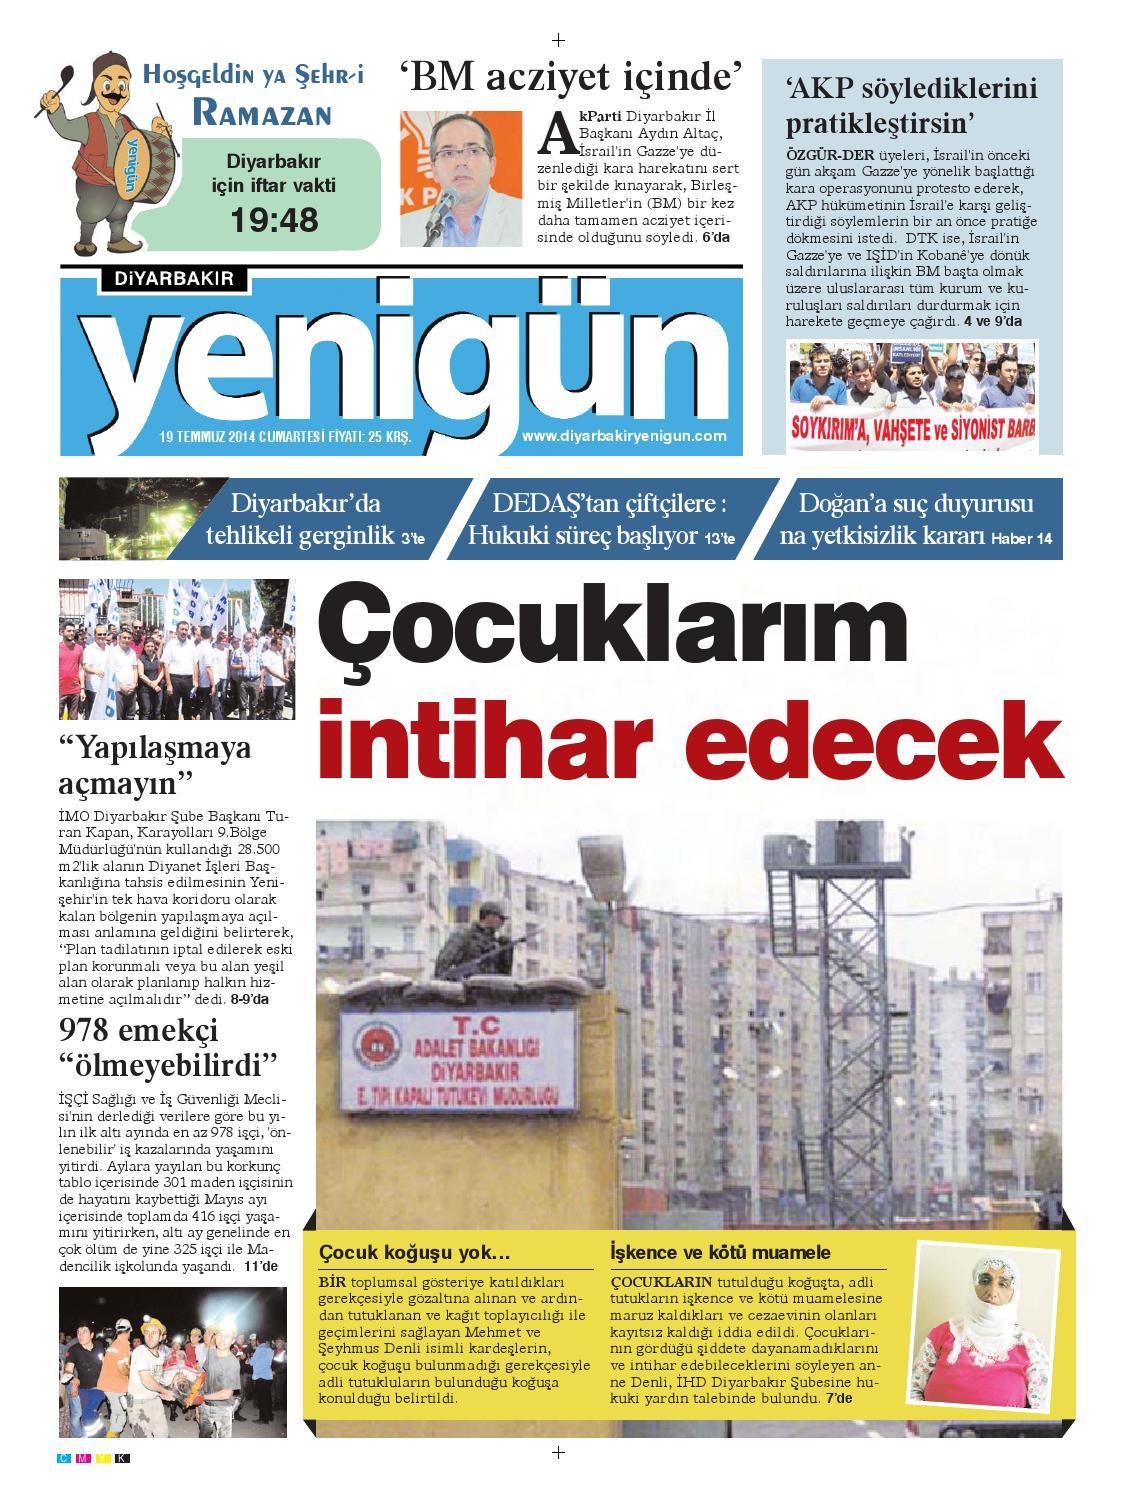 19 07 14 0 By Osman Ergun Issuu